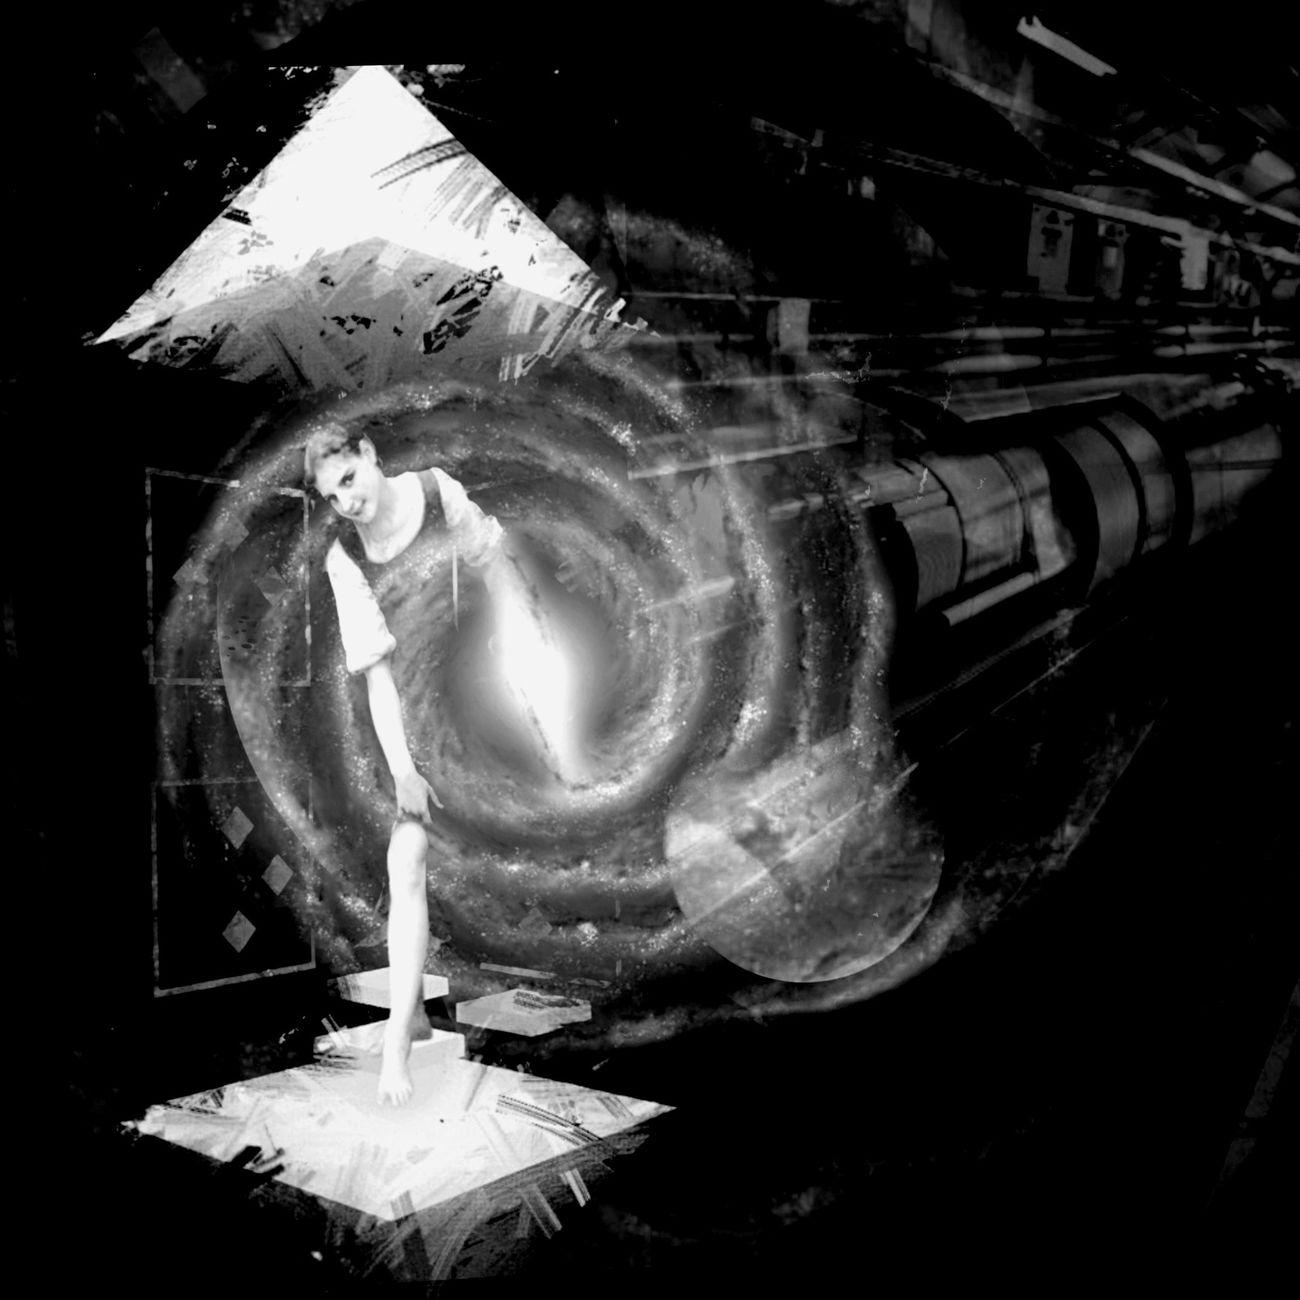 Cosmos Representation Science Fiction Chambre De Combustion Accelerator Various Energy Sources Noir Et Blanc Freestyle Light And Shadow